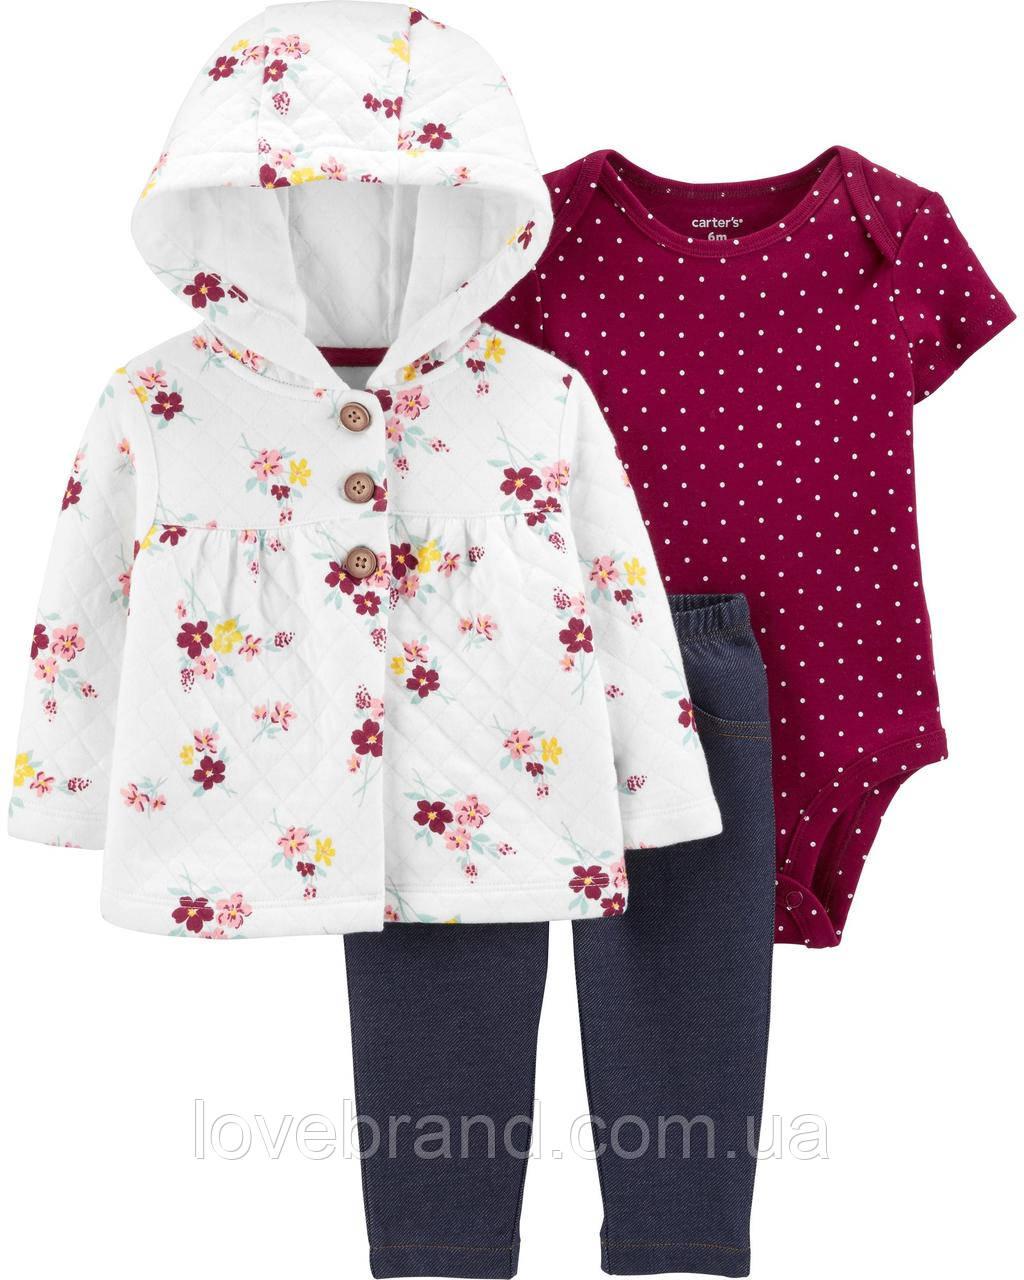 Набор для девочки Carter's стеганая кофта+ боди + лосинки, костюм кофточка на пуговички в цветочки картерс